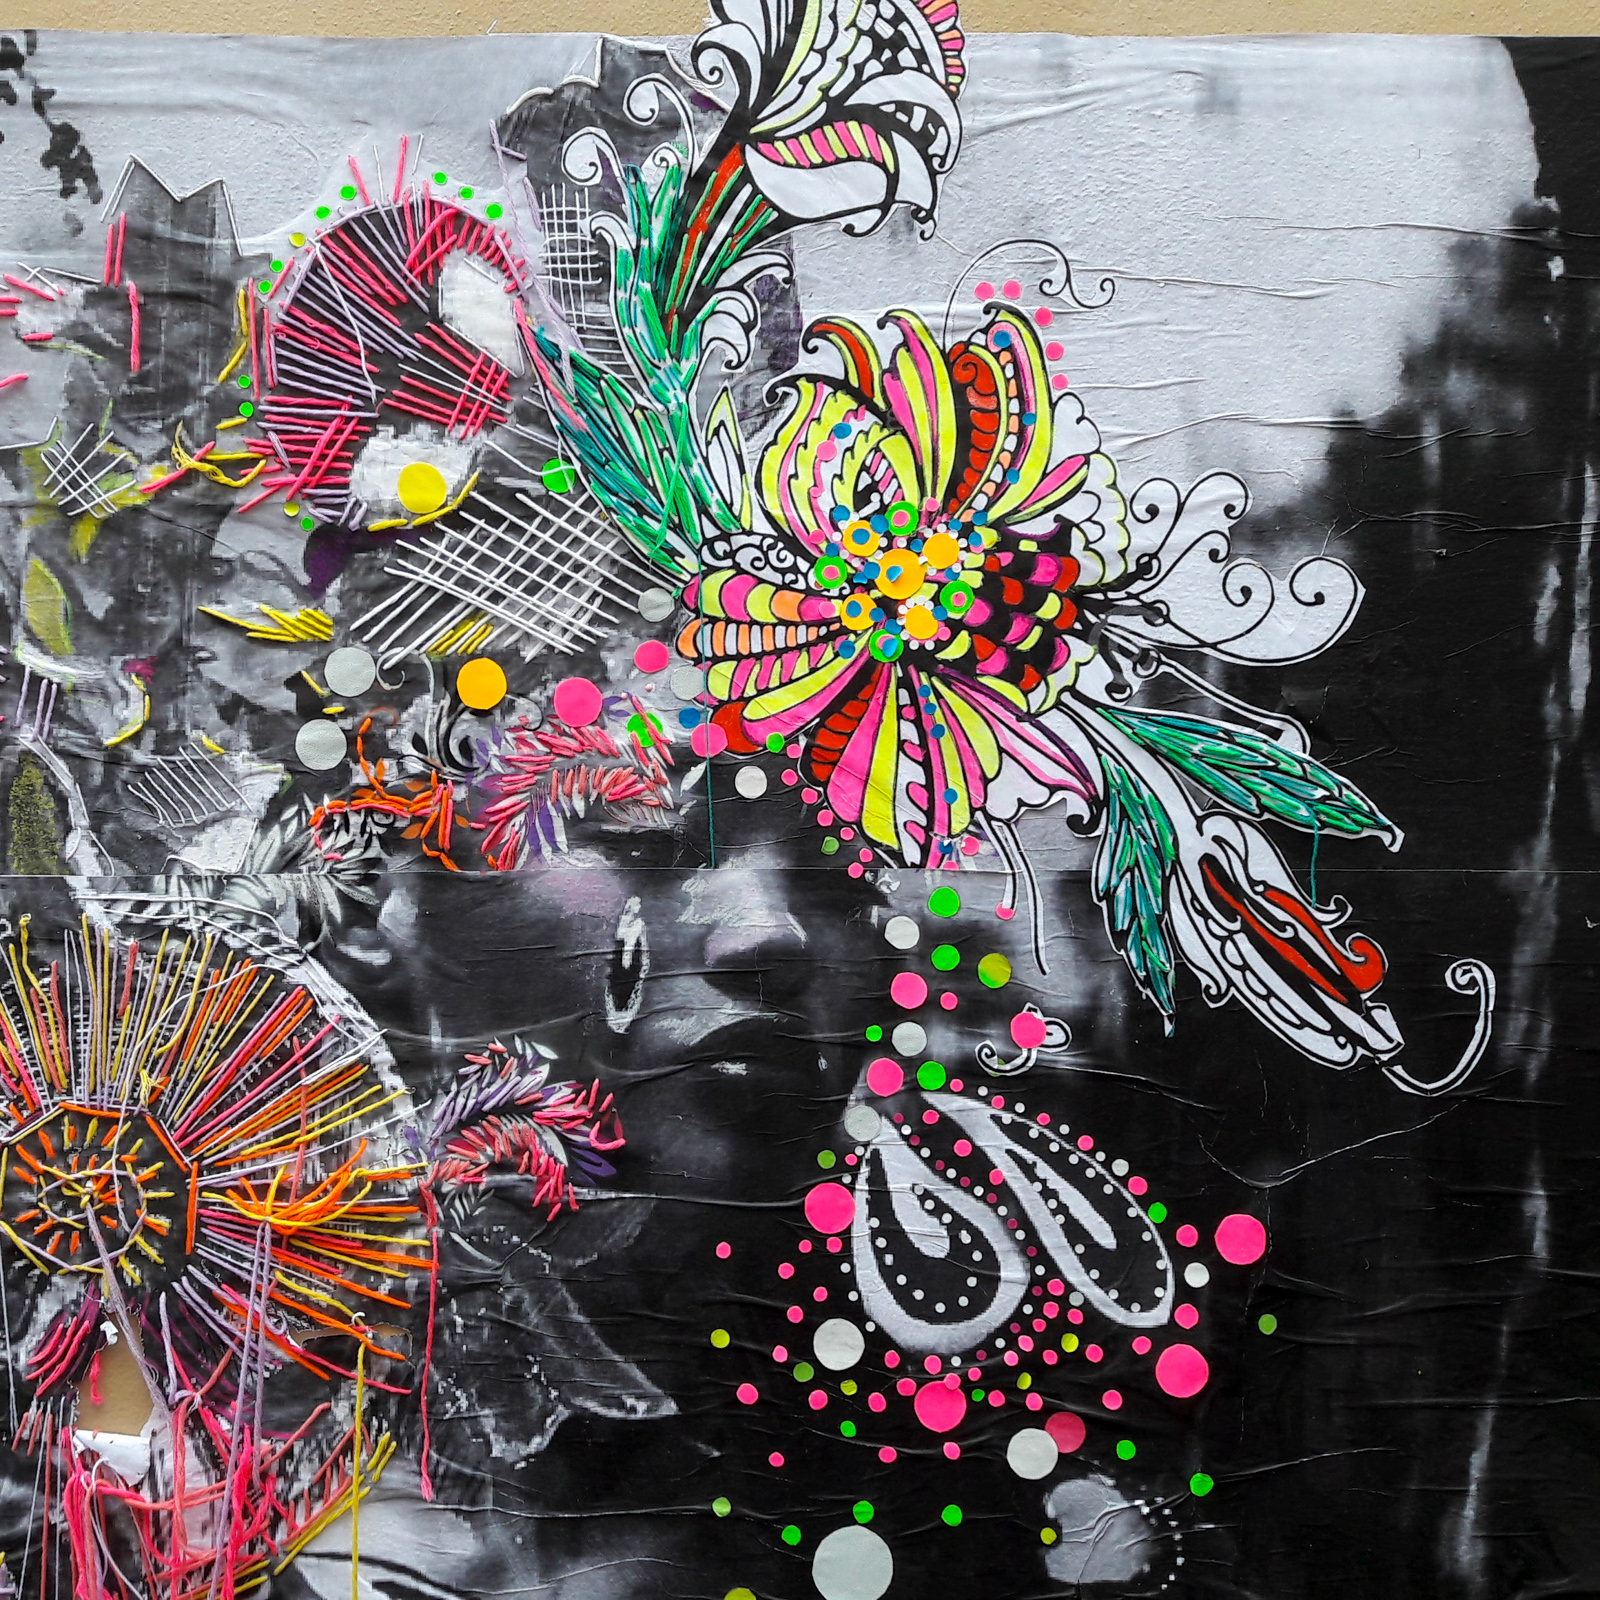 street art, street art paris, street art 75020, street art paris 20, street art, street art rue de la villette